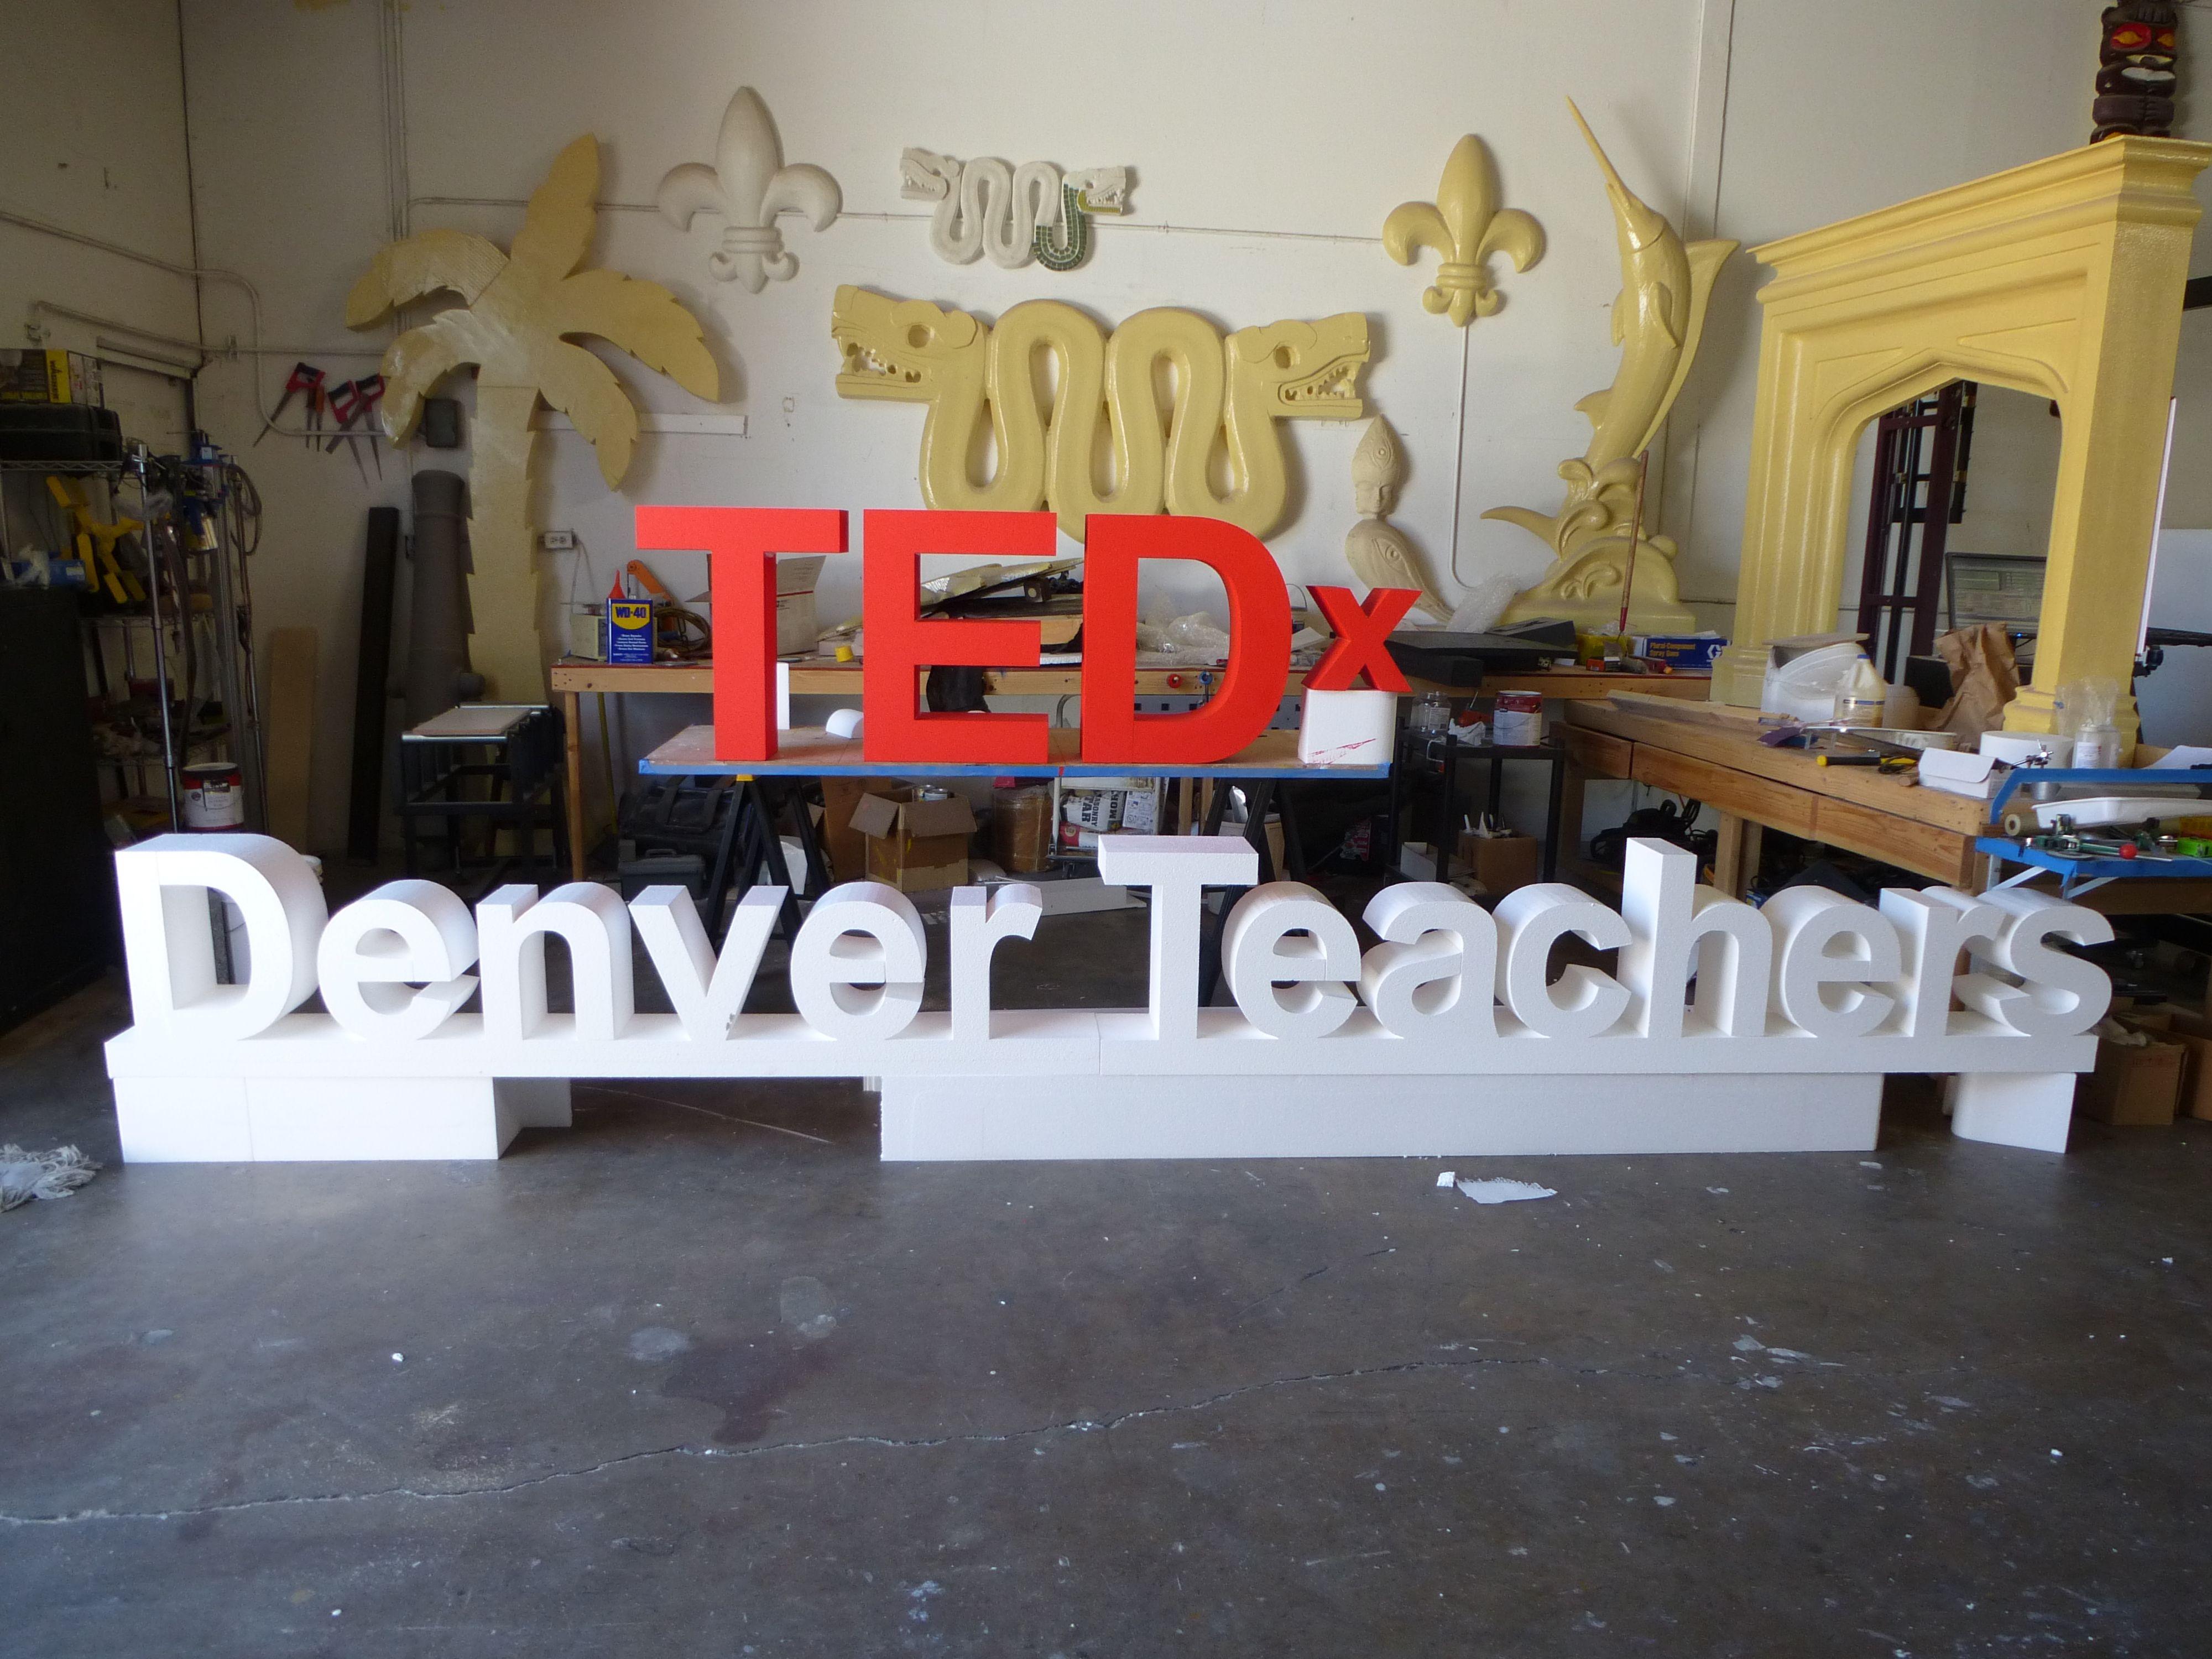 Eps foam dimensional lessters sign for tedx by wecutfoam